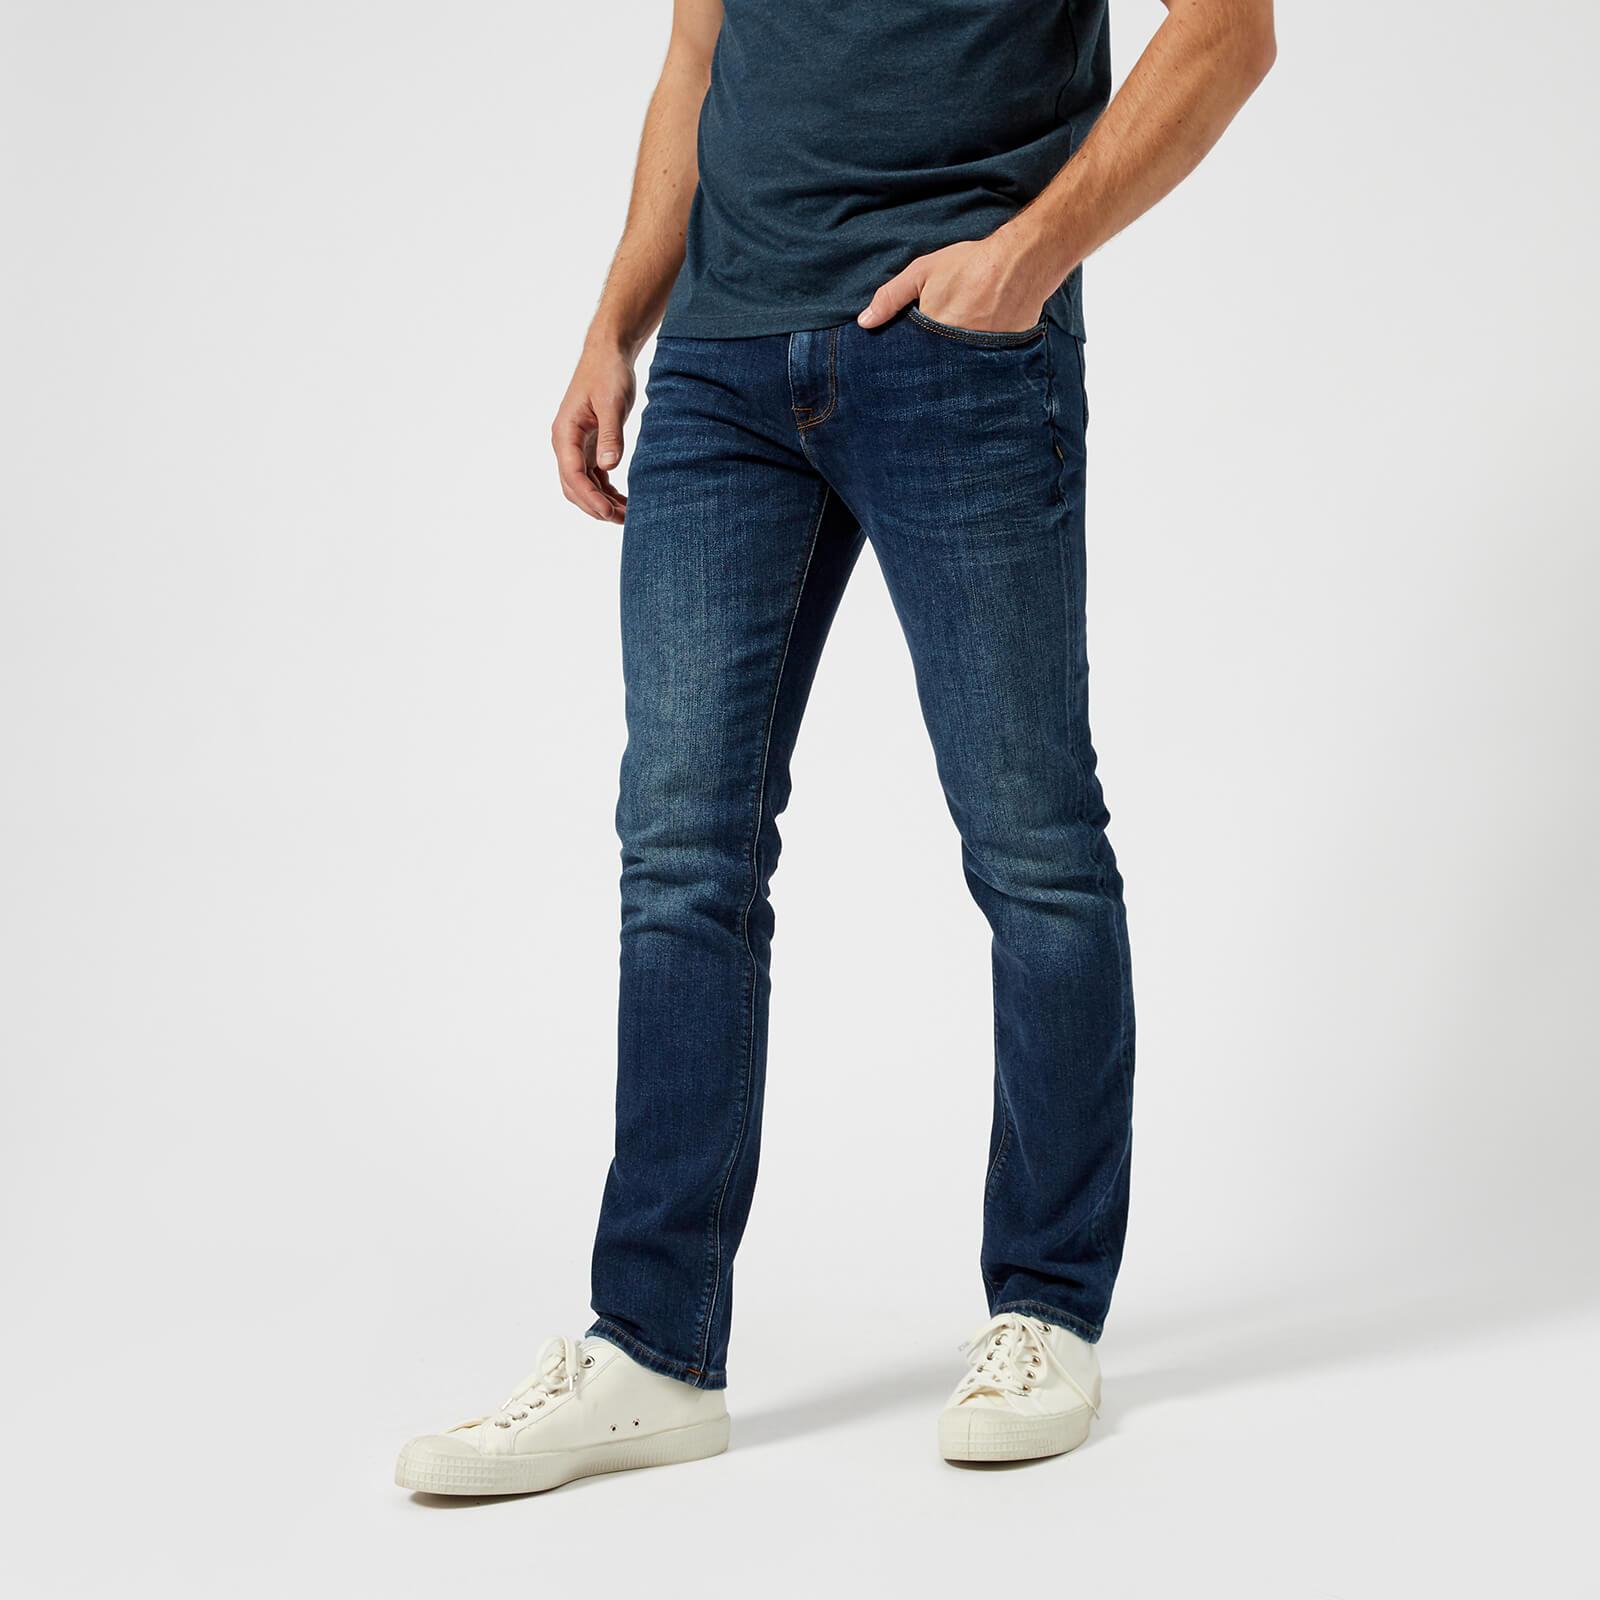 Tommy Hilfiger Men's Core Denton Straight Jeans - New Dark Stone - W36/L32